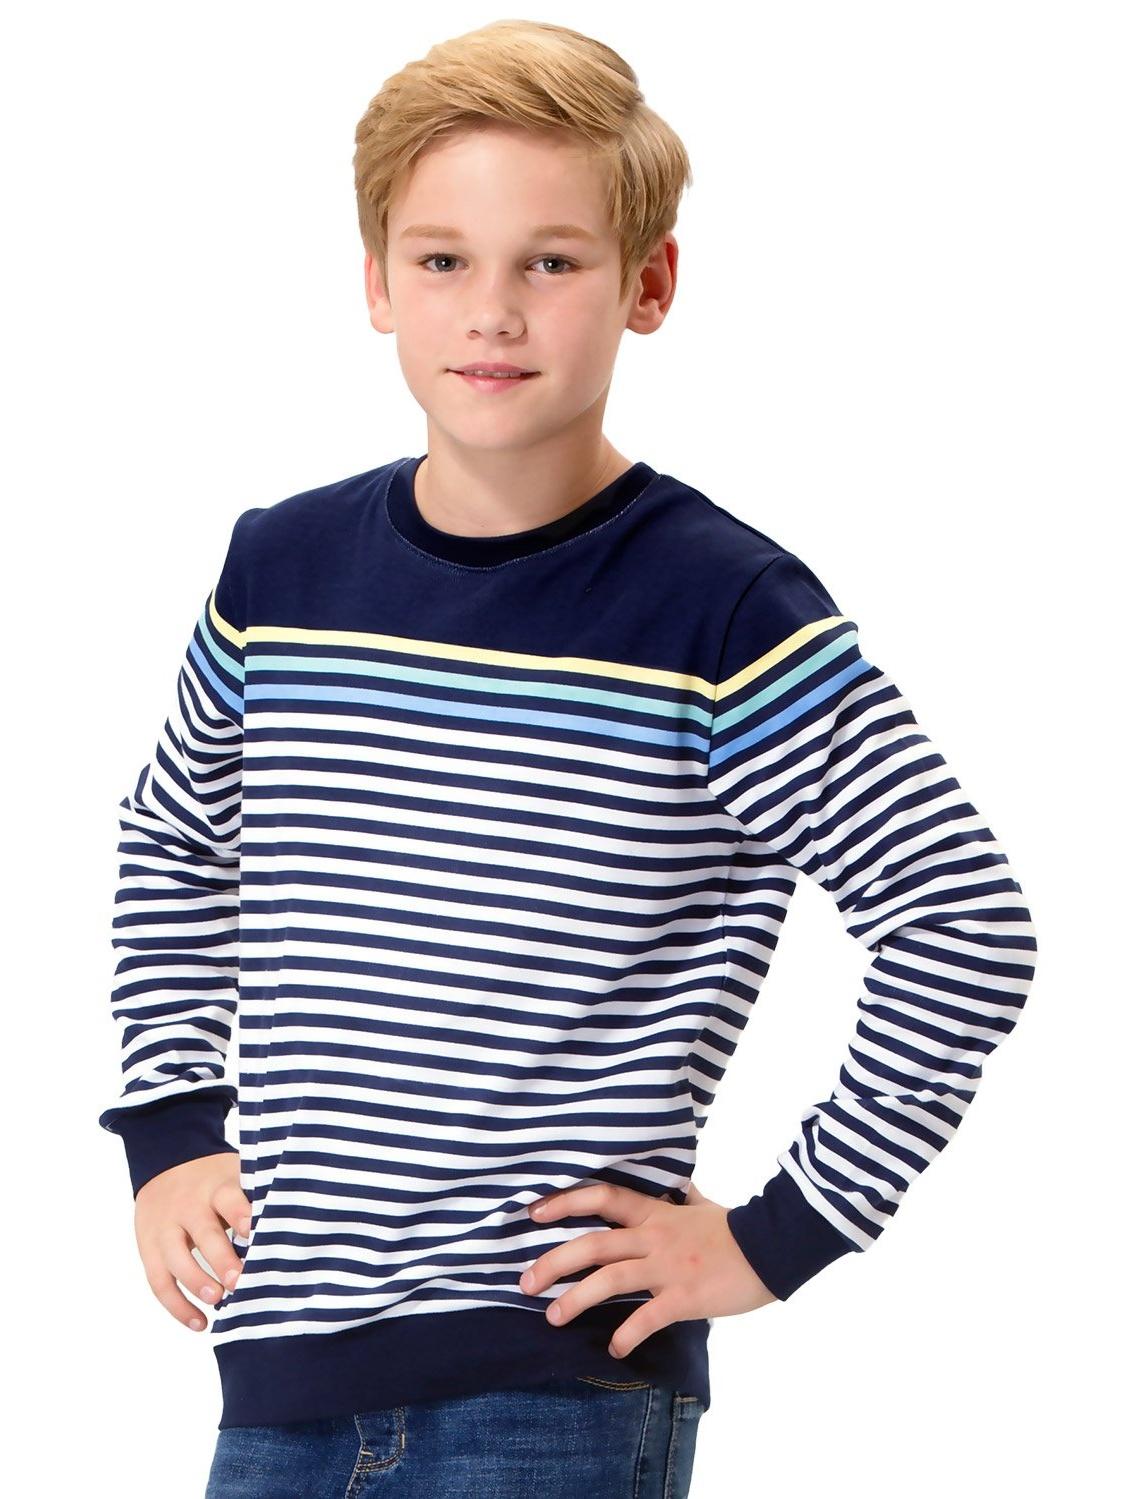 Leo&Lily Big Boys Kids Cotton Stripes Crew Sweatshirt T-Shirts